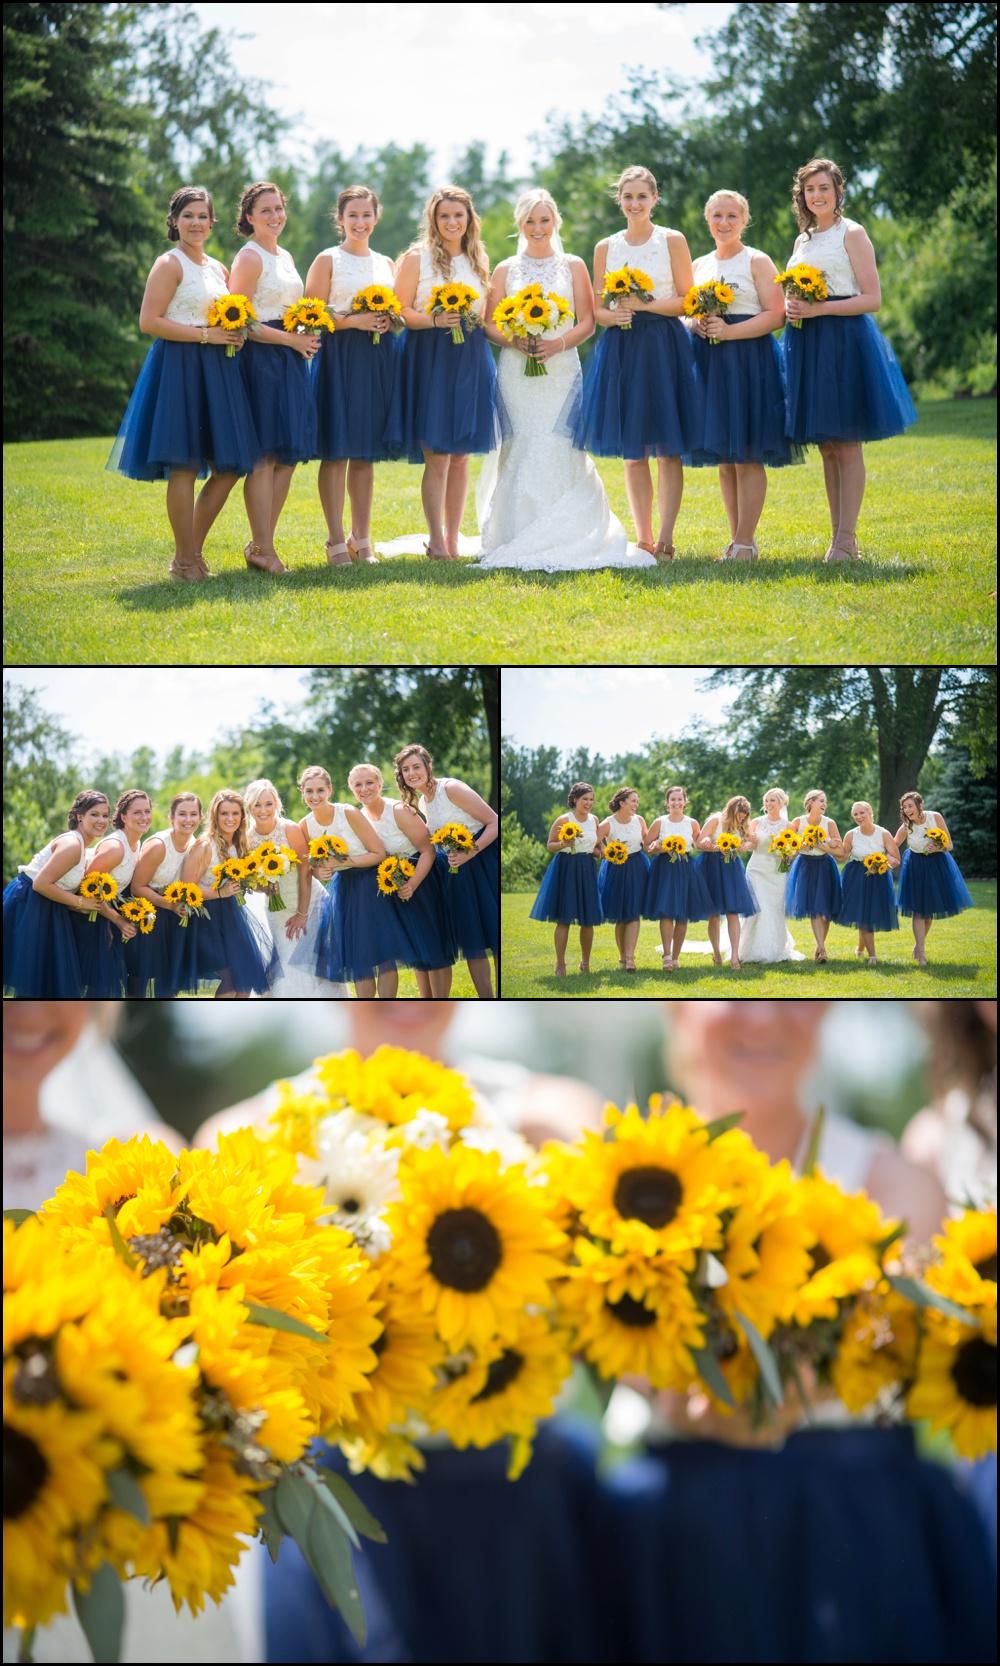 Mustard Seed Garden Wedding Pictures-009.jpg